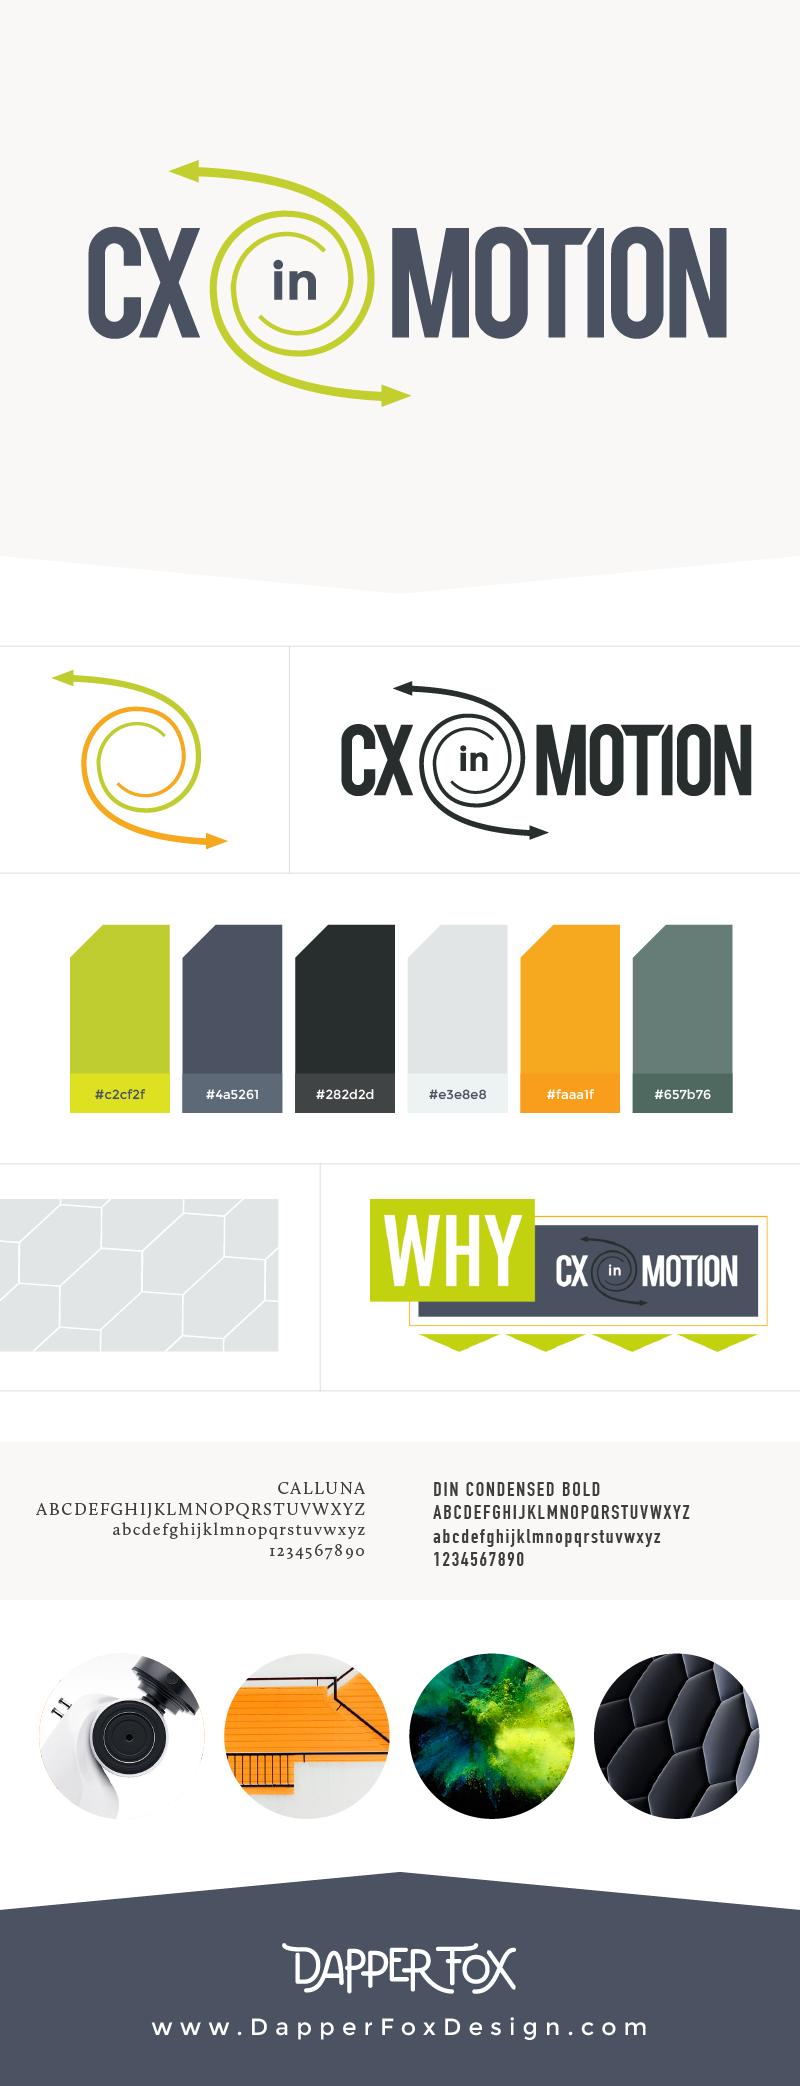 CX in Motion - Technology Company based in UK - Modern Logo and Branding - Logo, Blog and Website Design by Dapper Fox in Park City, Utah.  #modernlogo  #corporatelogo    #consultantlogo  #cleanlogo  #logodesigninspiration  #logodesign    #branding